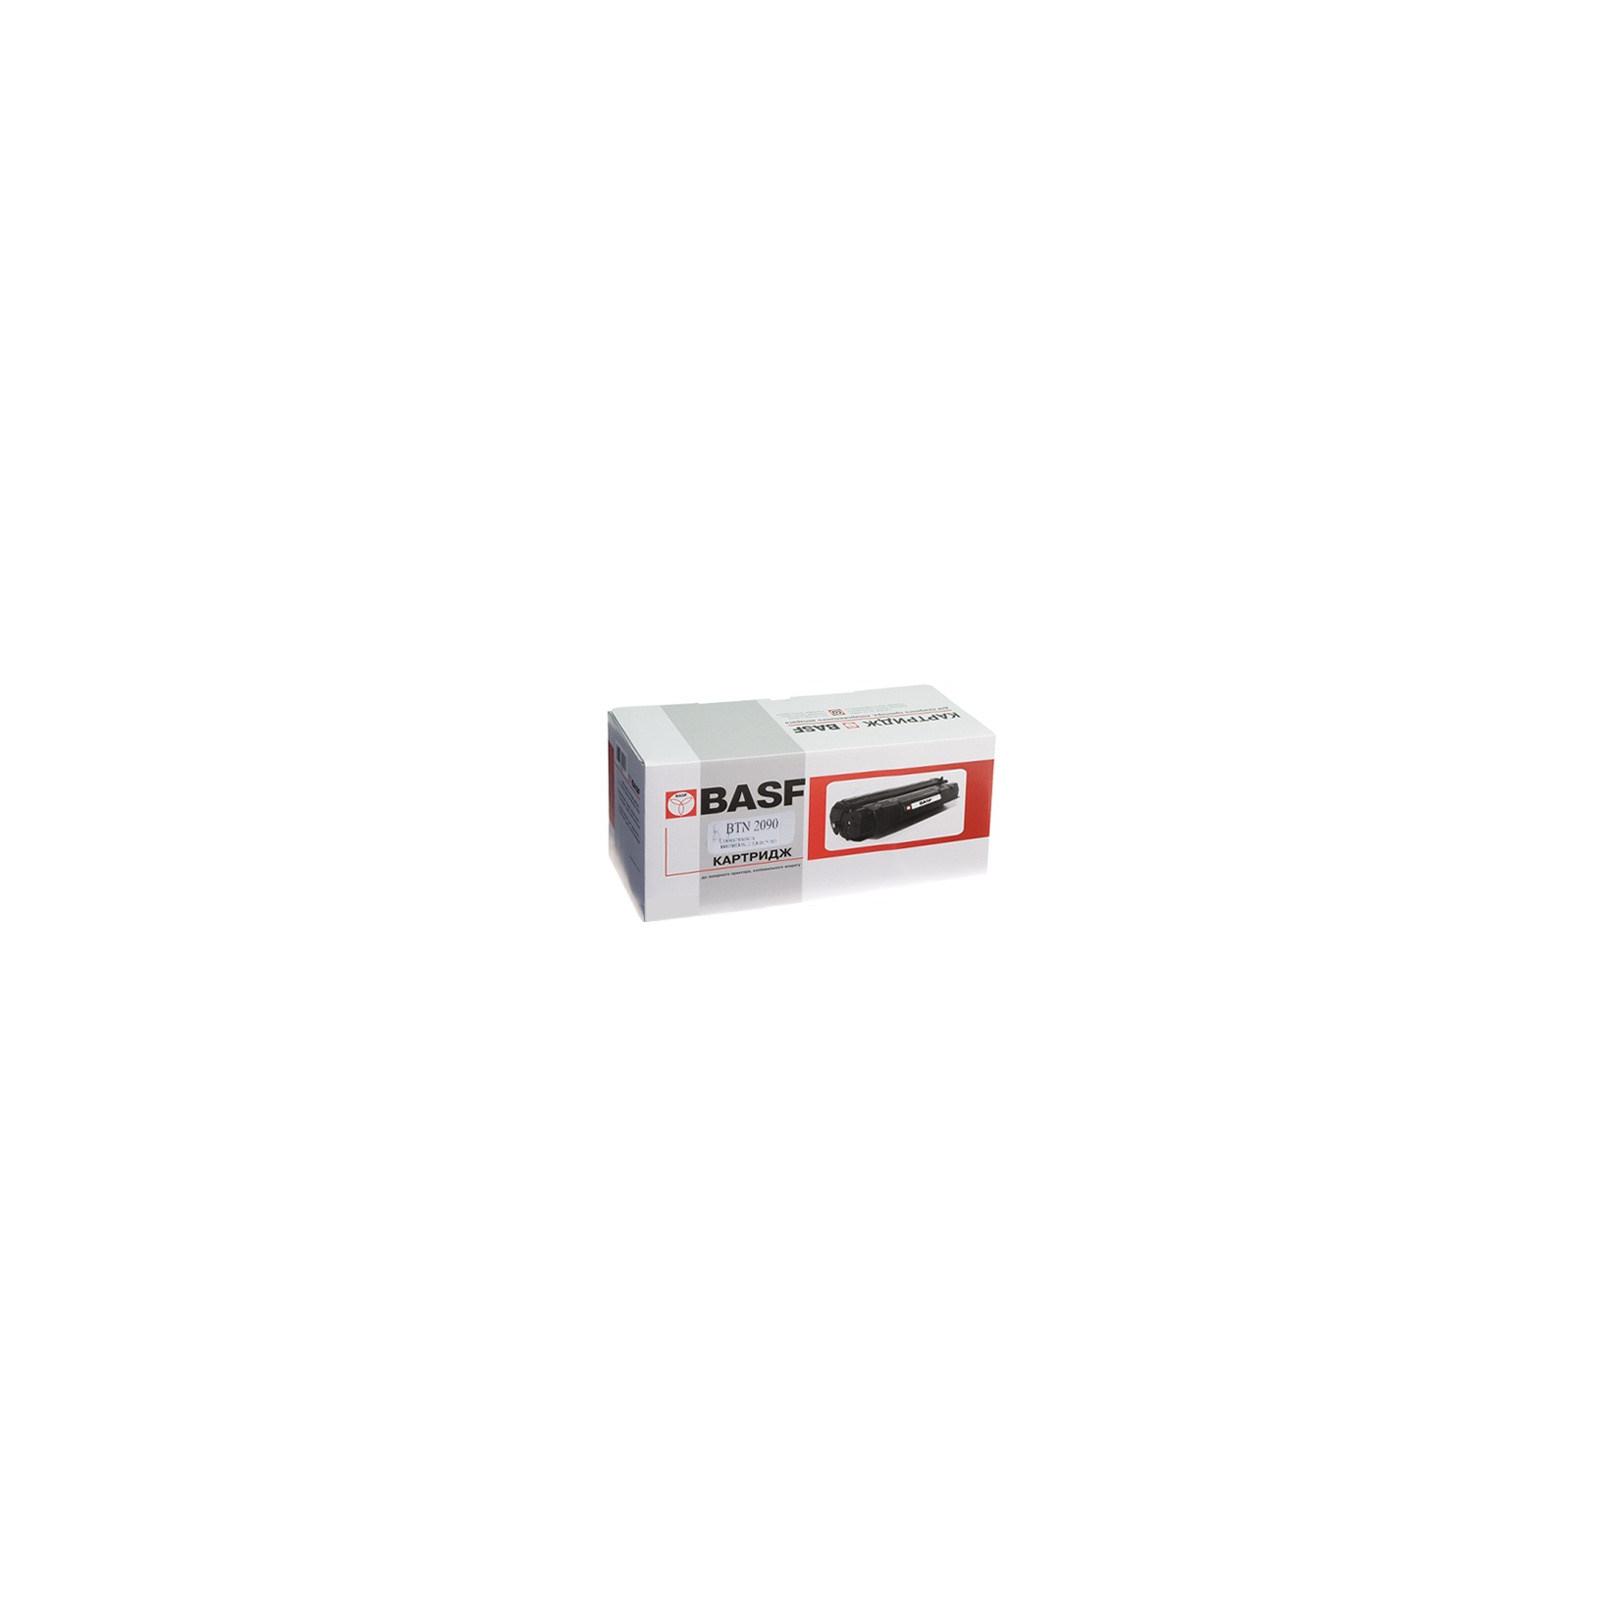 Картридж BASF для BROTHER HL-2132R/DCP-7057 (BTN2090)